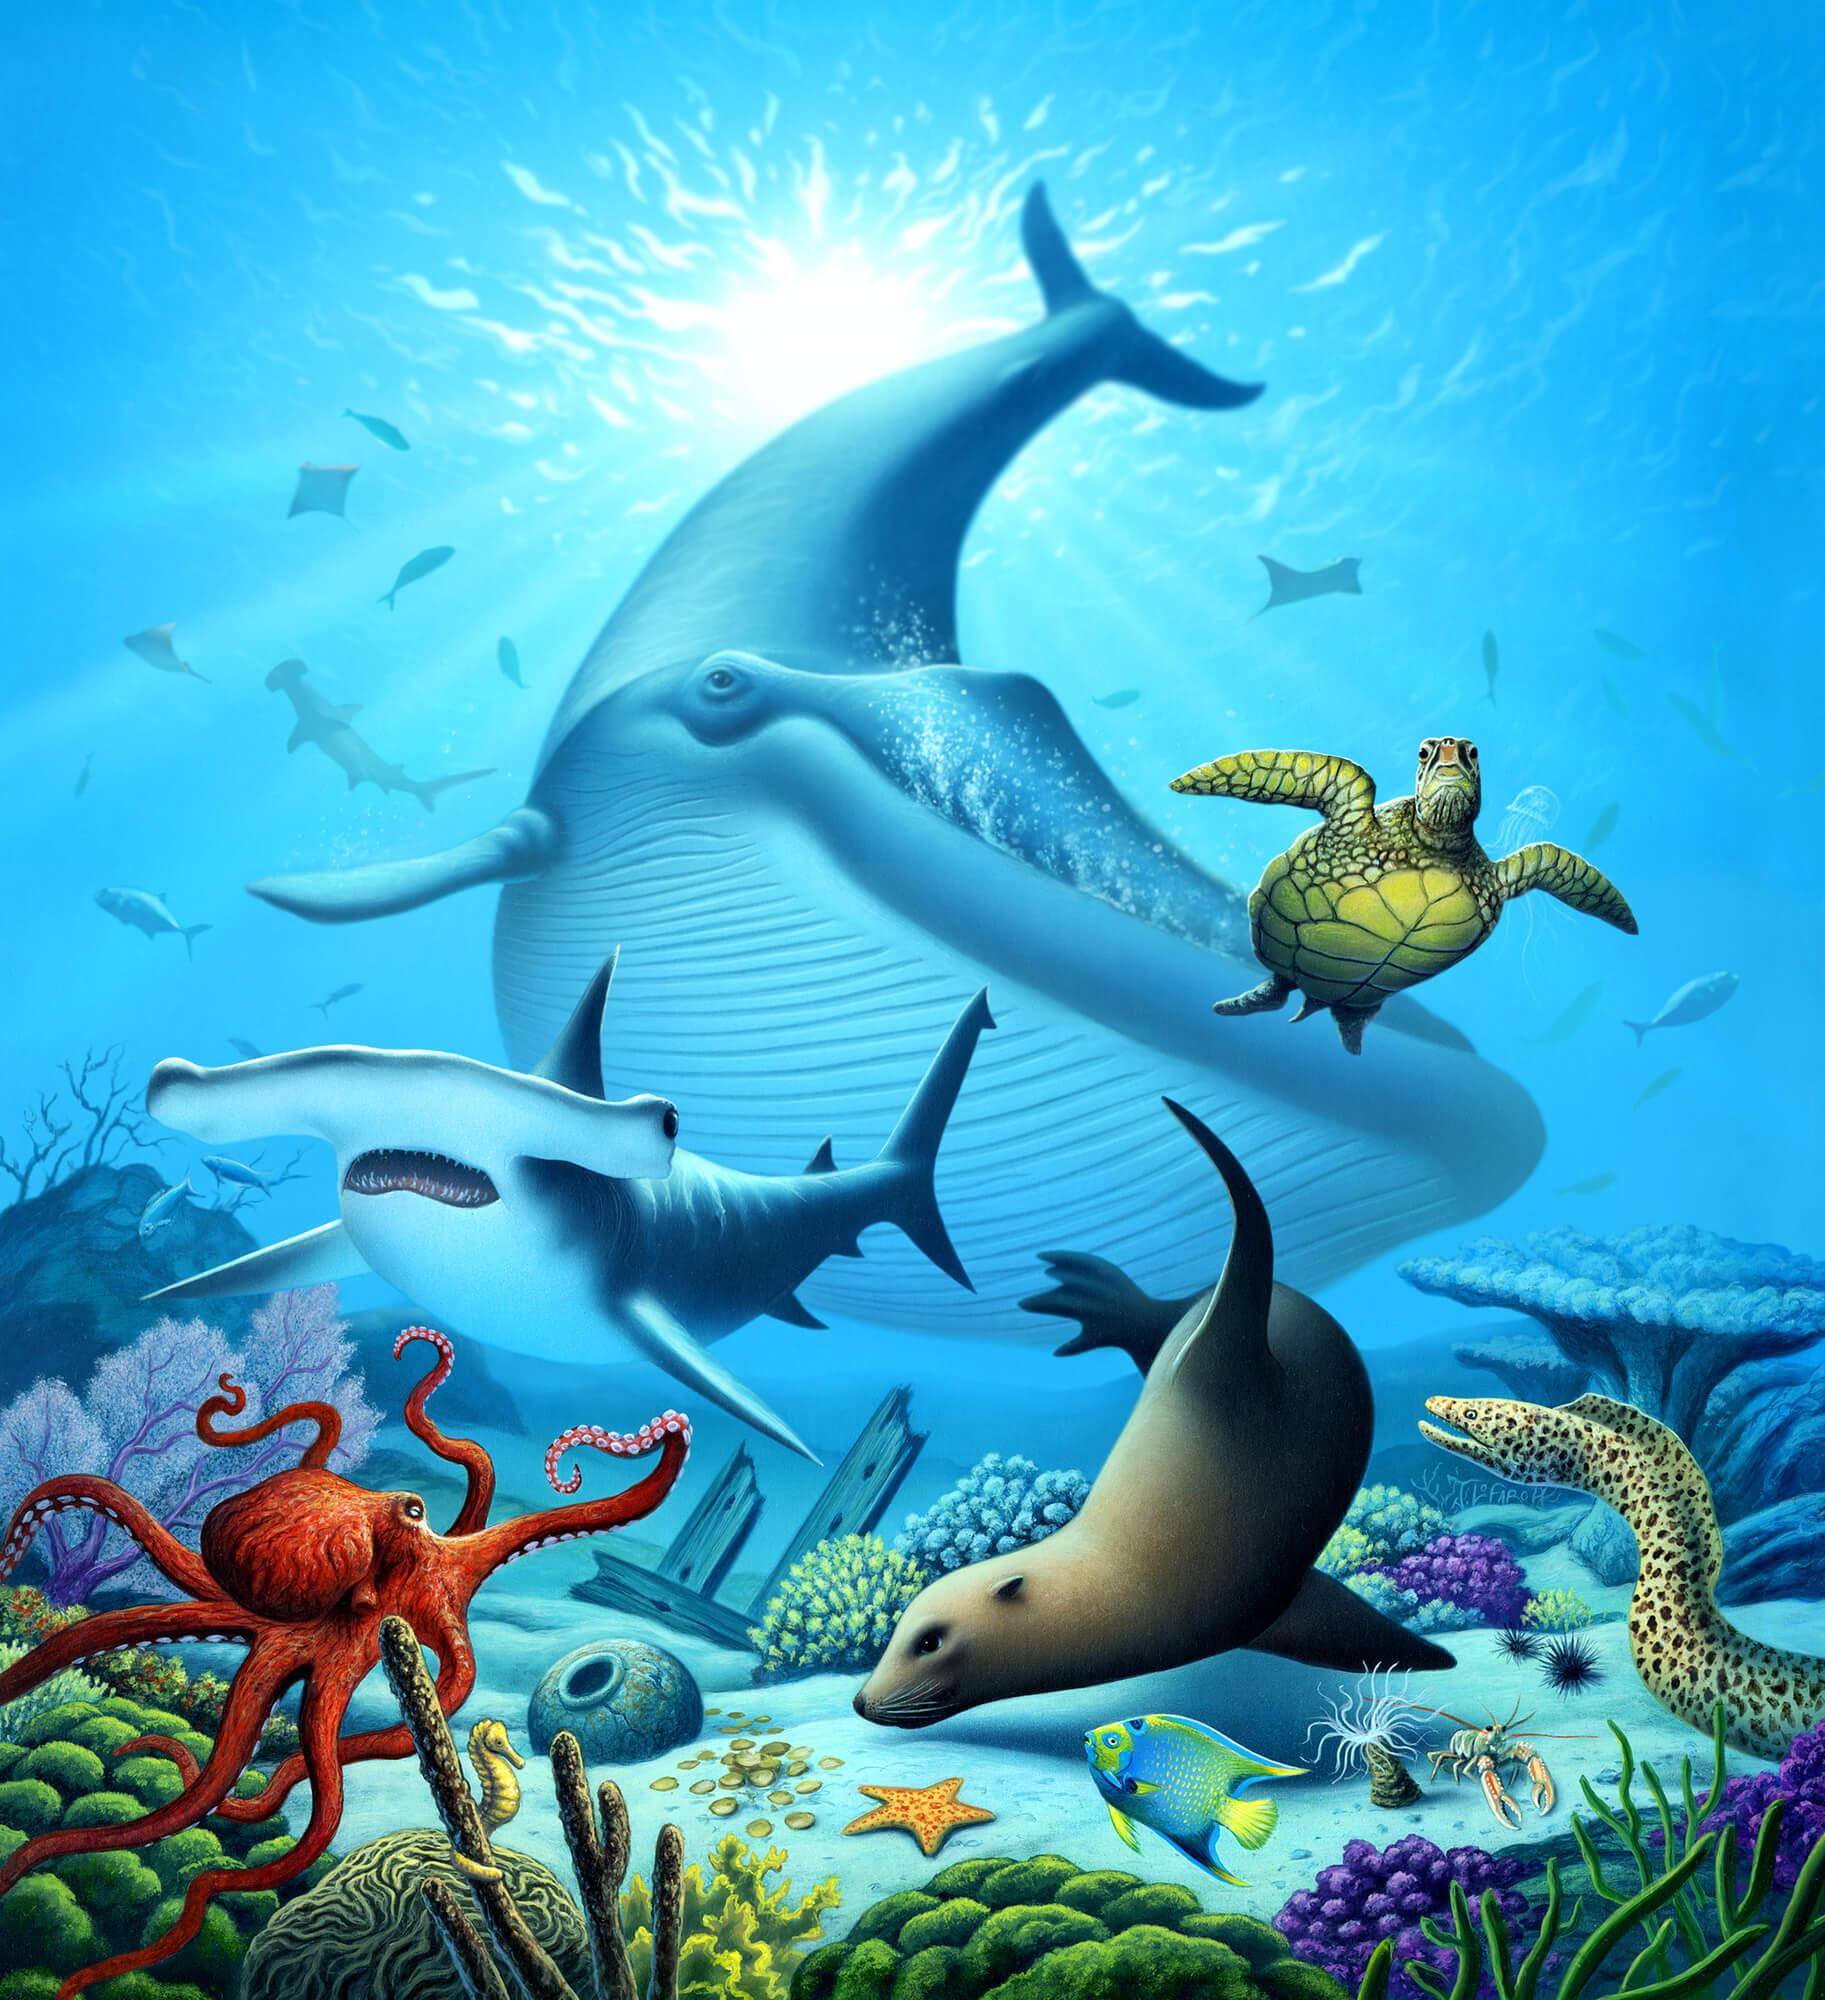 Ocean Wall Murals Ocean Life Wall Mural Amp Ocean Life Wallpaper Wallsauce Uk